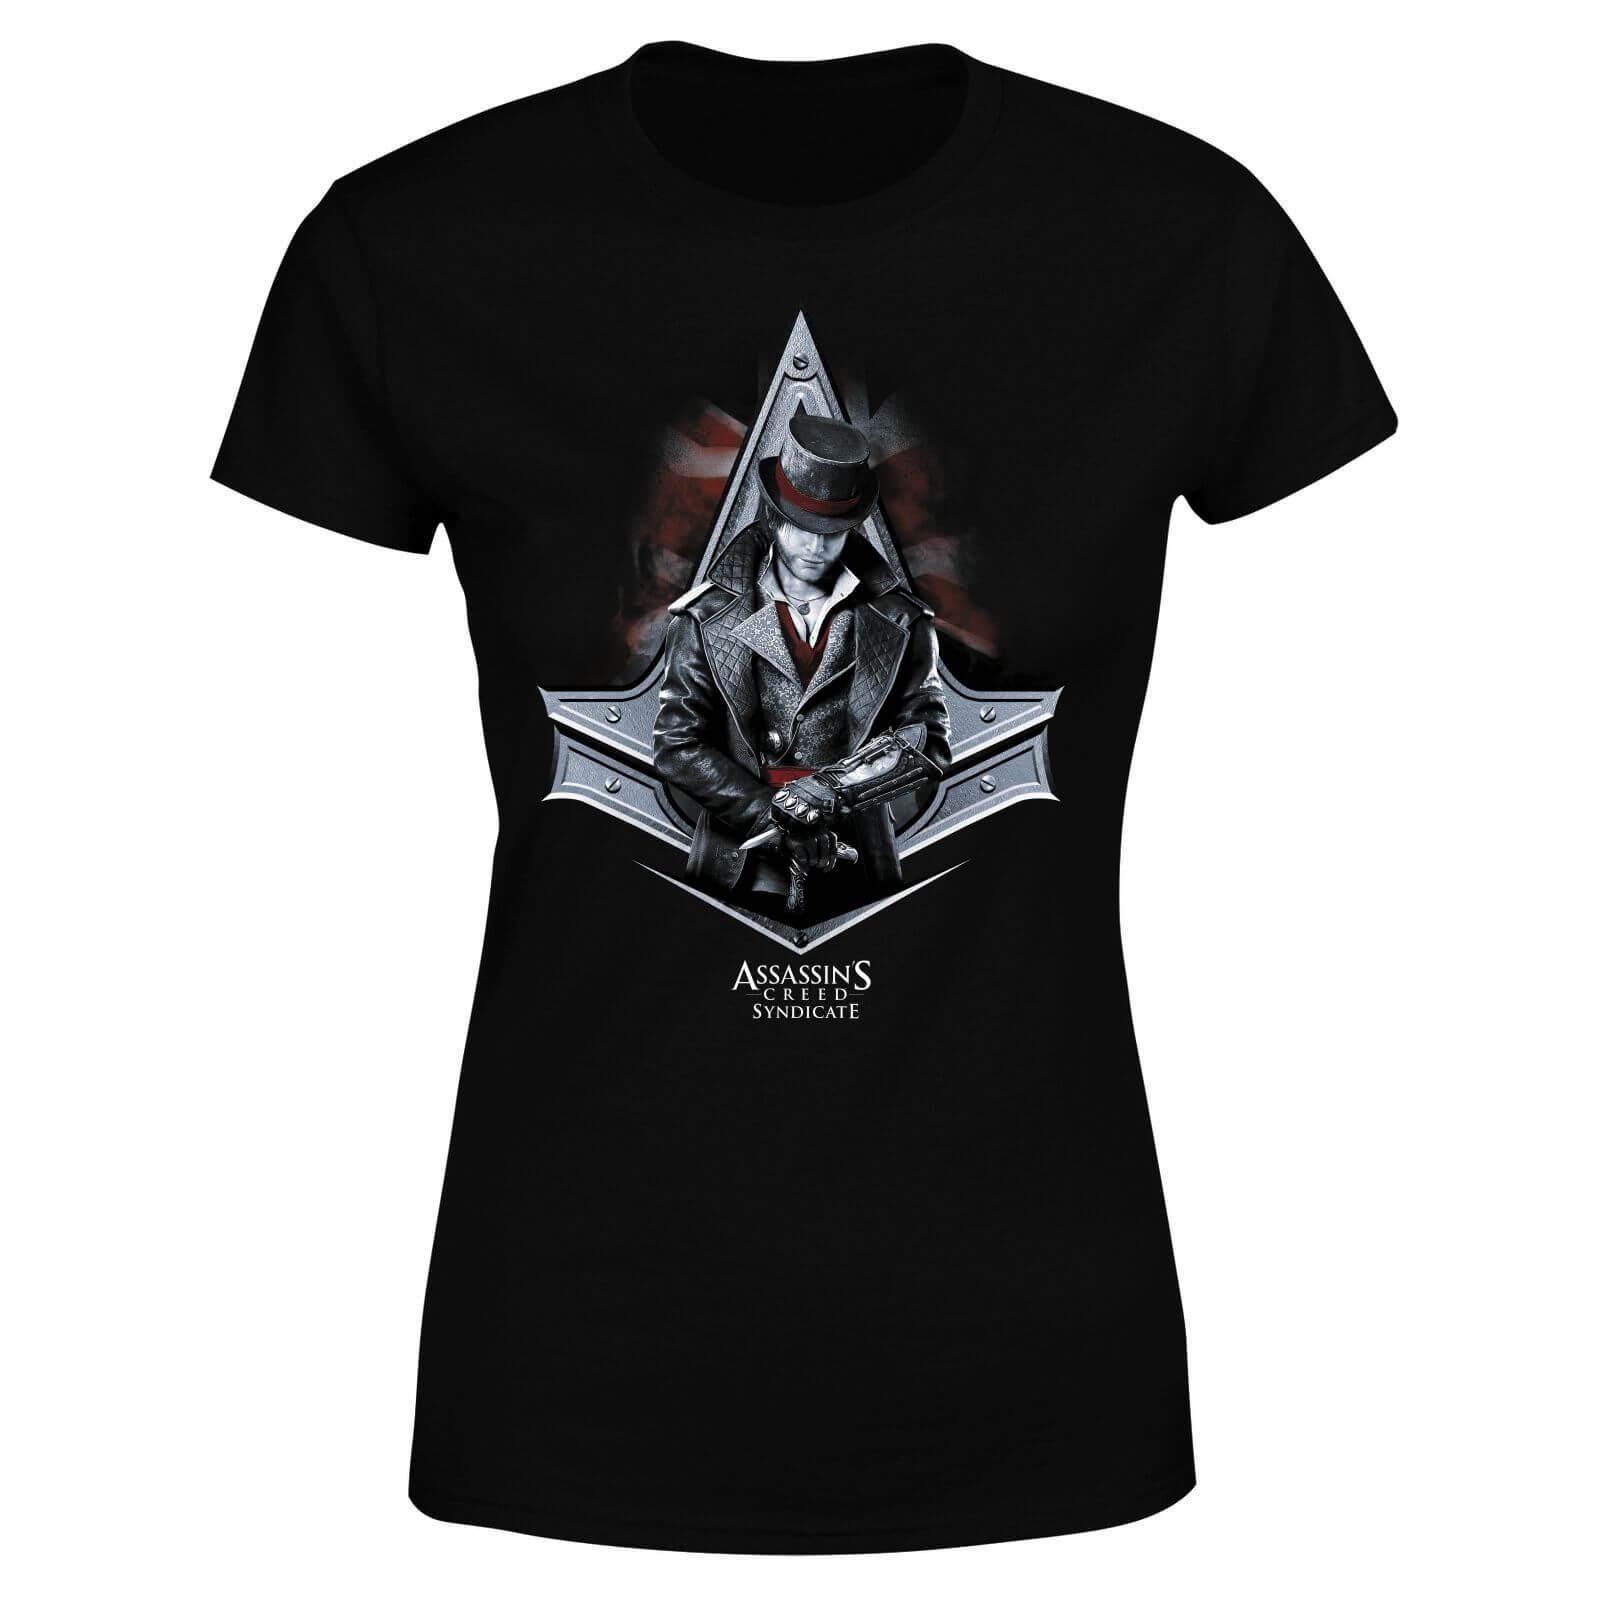 Assassin's Creed T-Shirt Femme Jacob Assassin's Creed Syndicate - Noir - XL - Noir